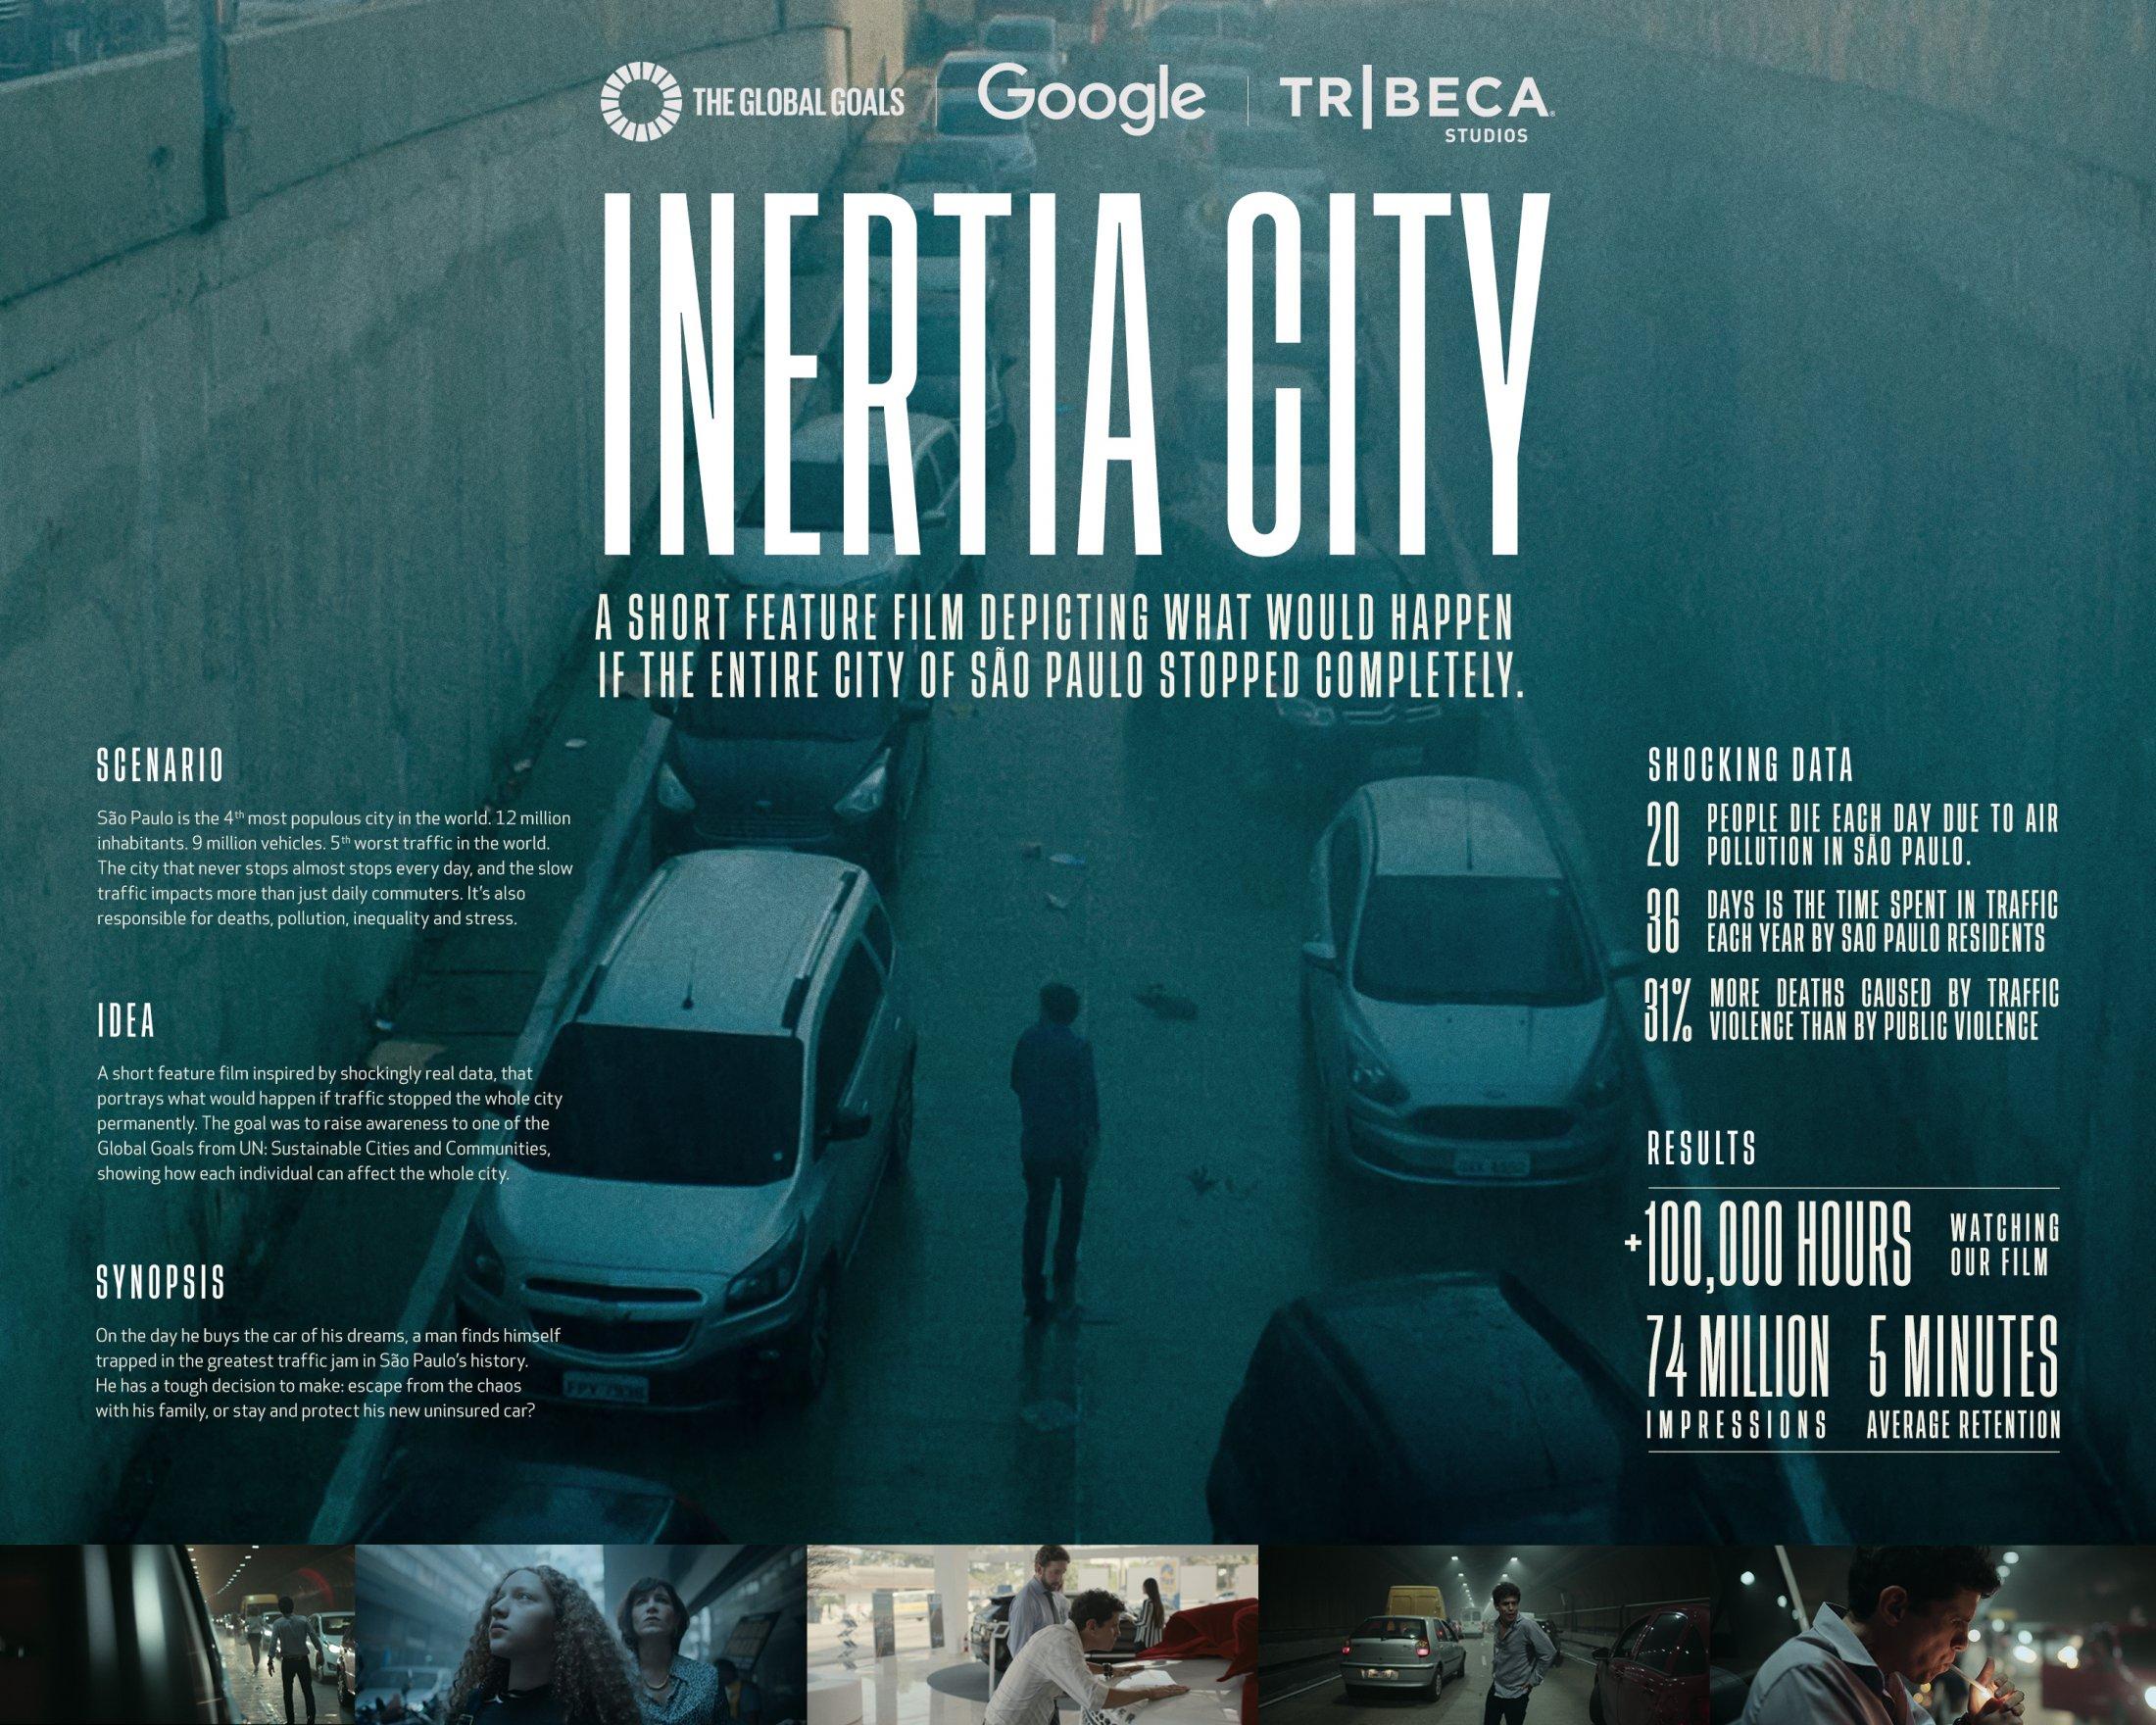 Thumbnail for Inertia City